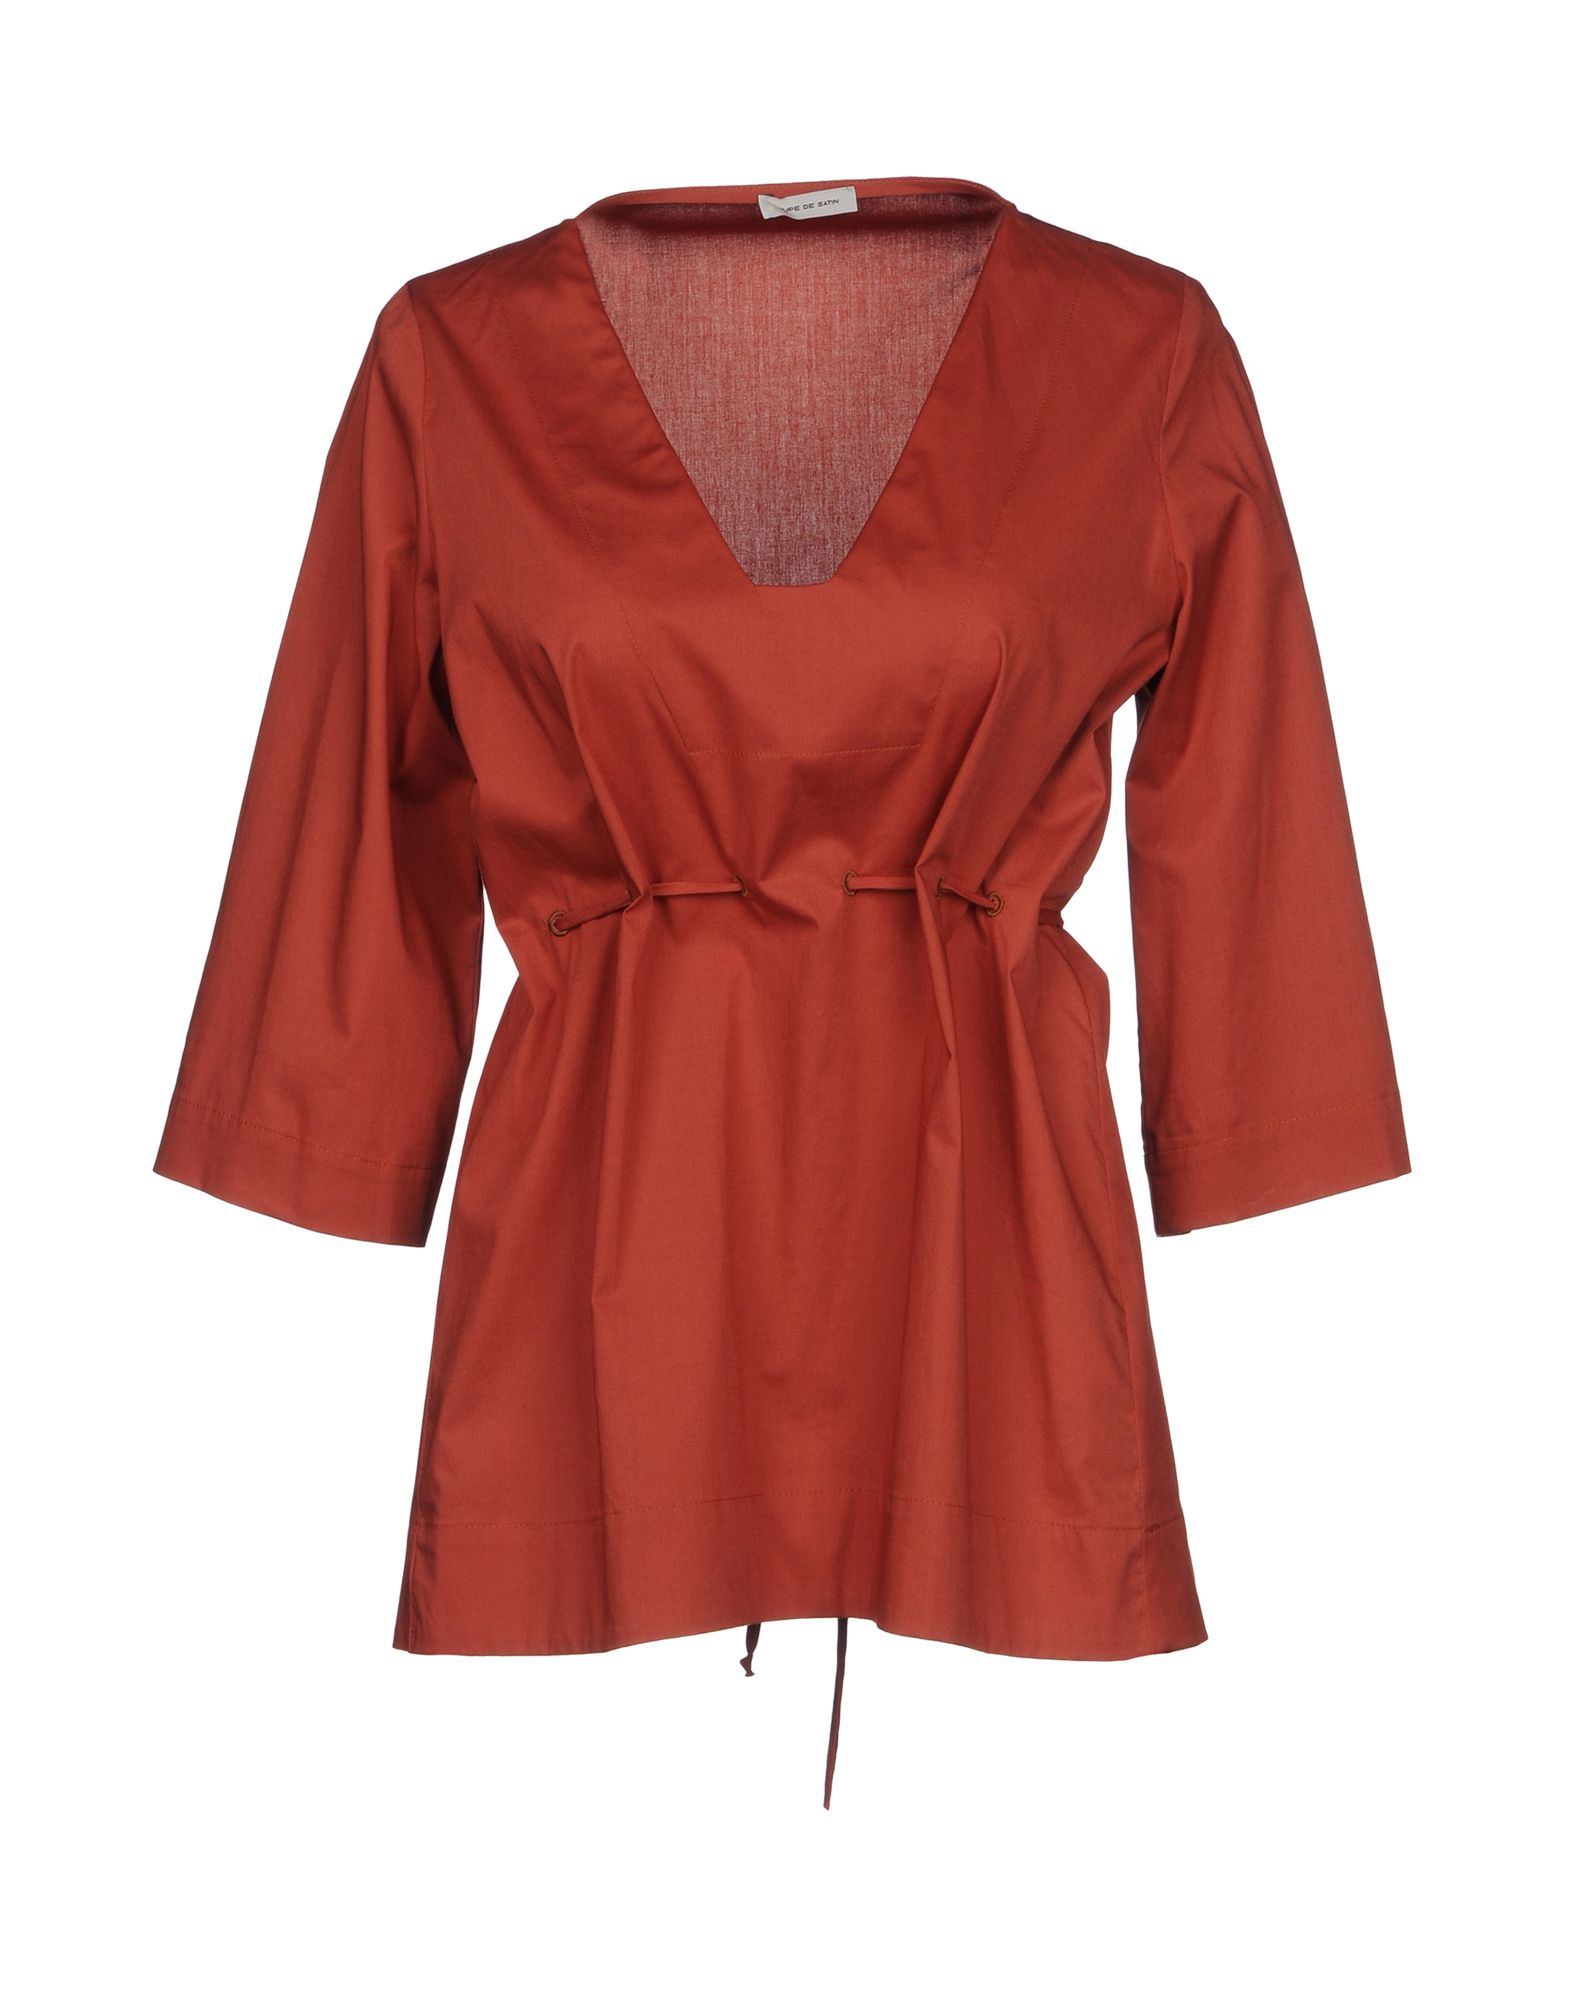 JUPE DE SATIN Блузка v de vinster блузка